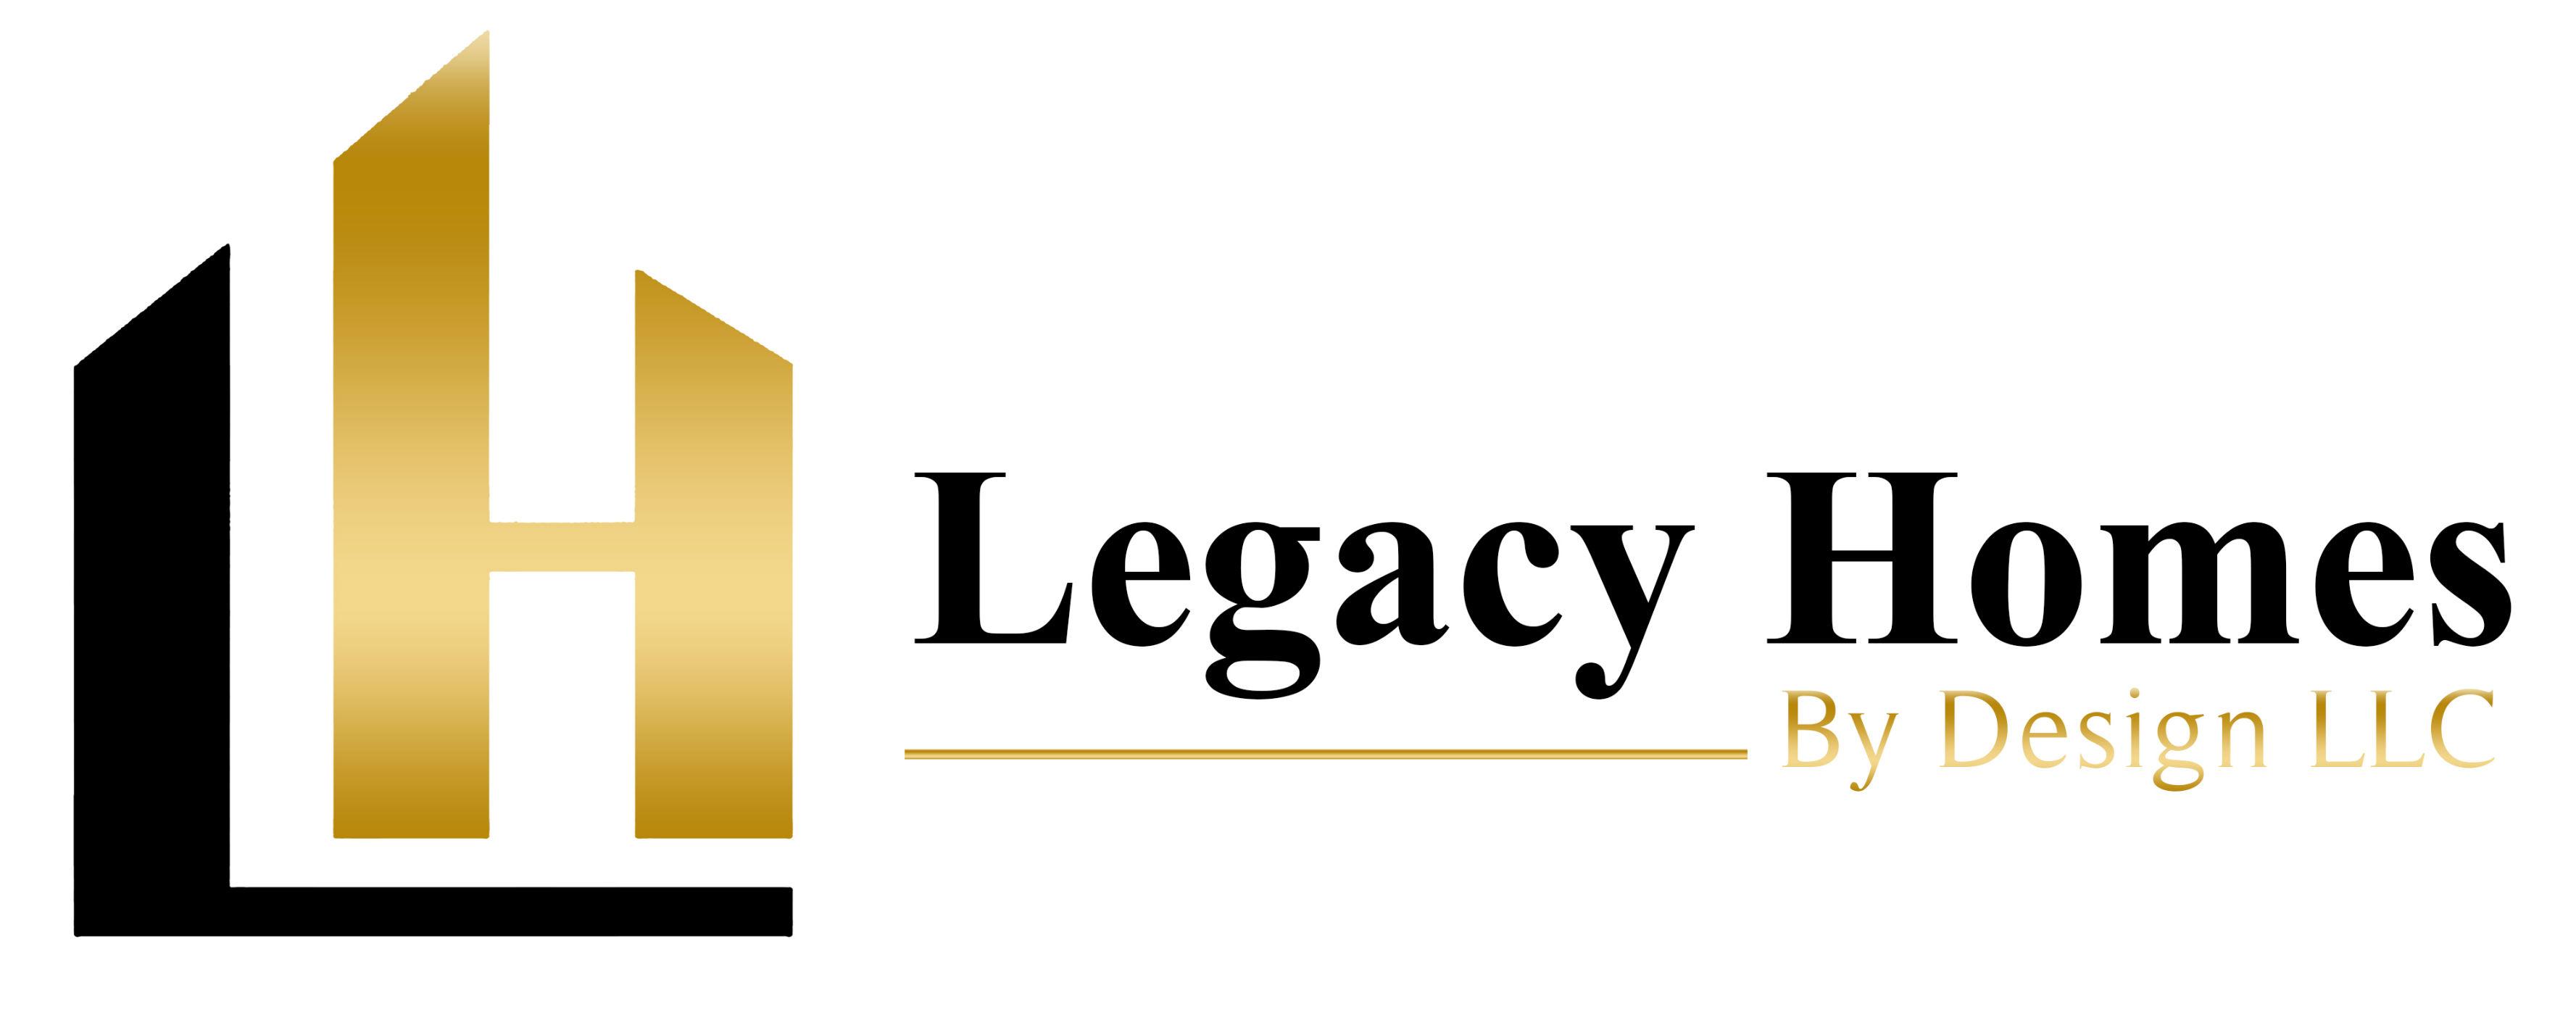 Legacy Homes by Design, LLC